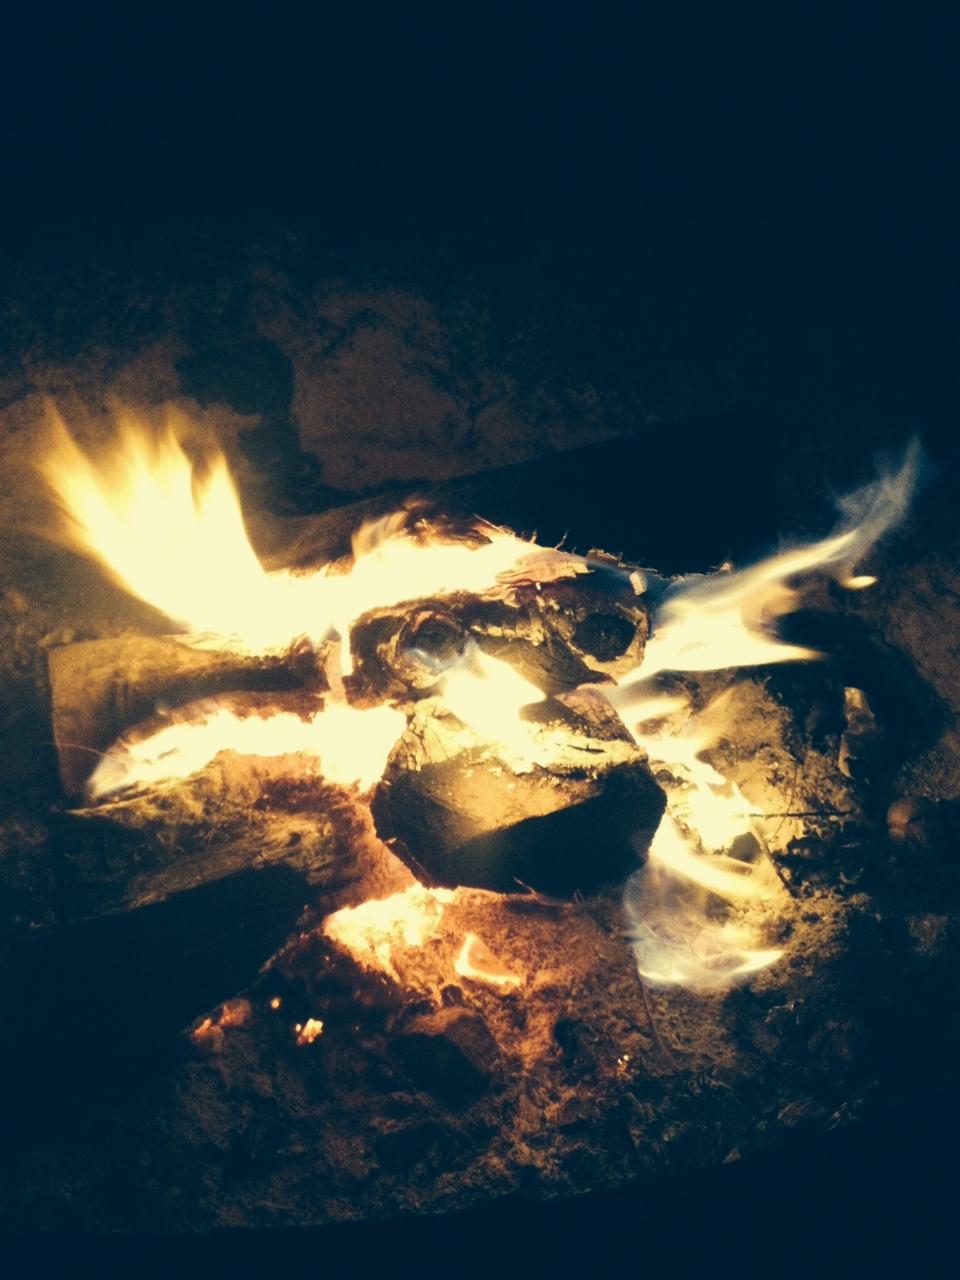 Birthday campfire